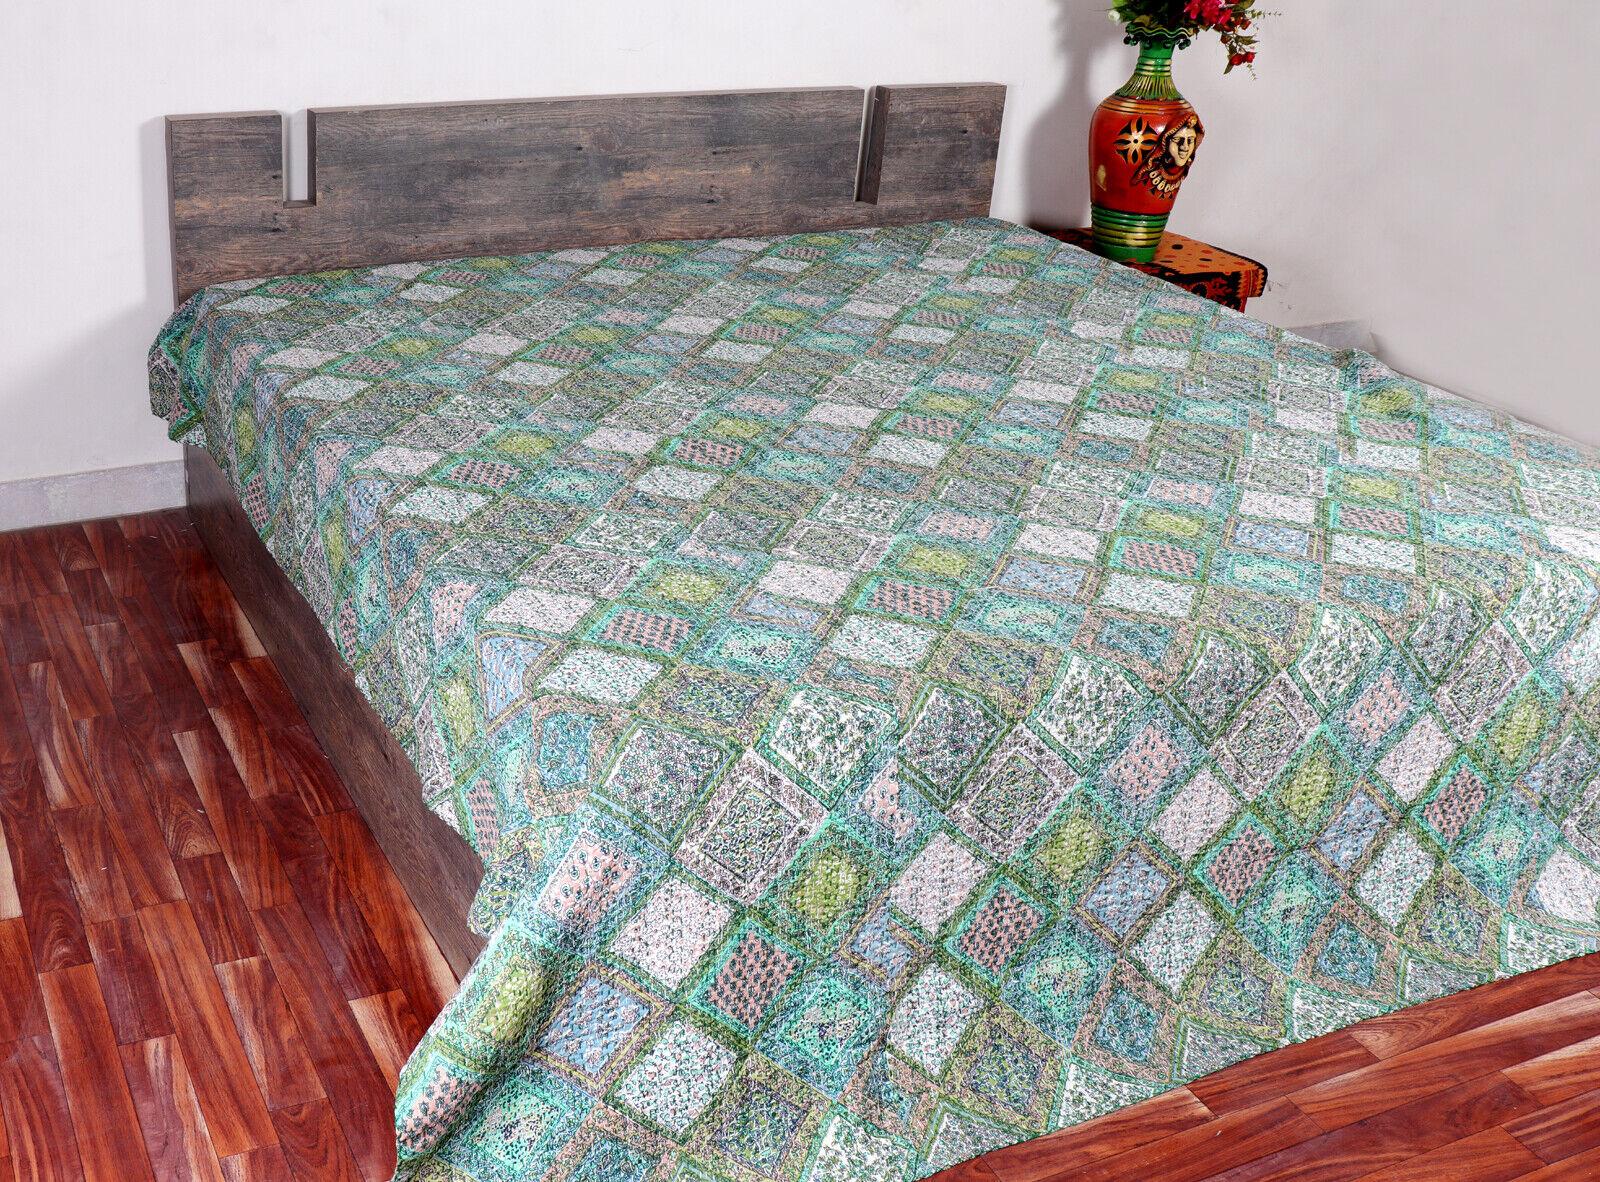 New Kantha Quilt Twin Size Bedsheet Handmade Throw Green Floral Bedcover Gudri